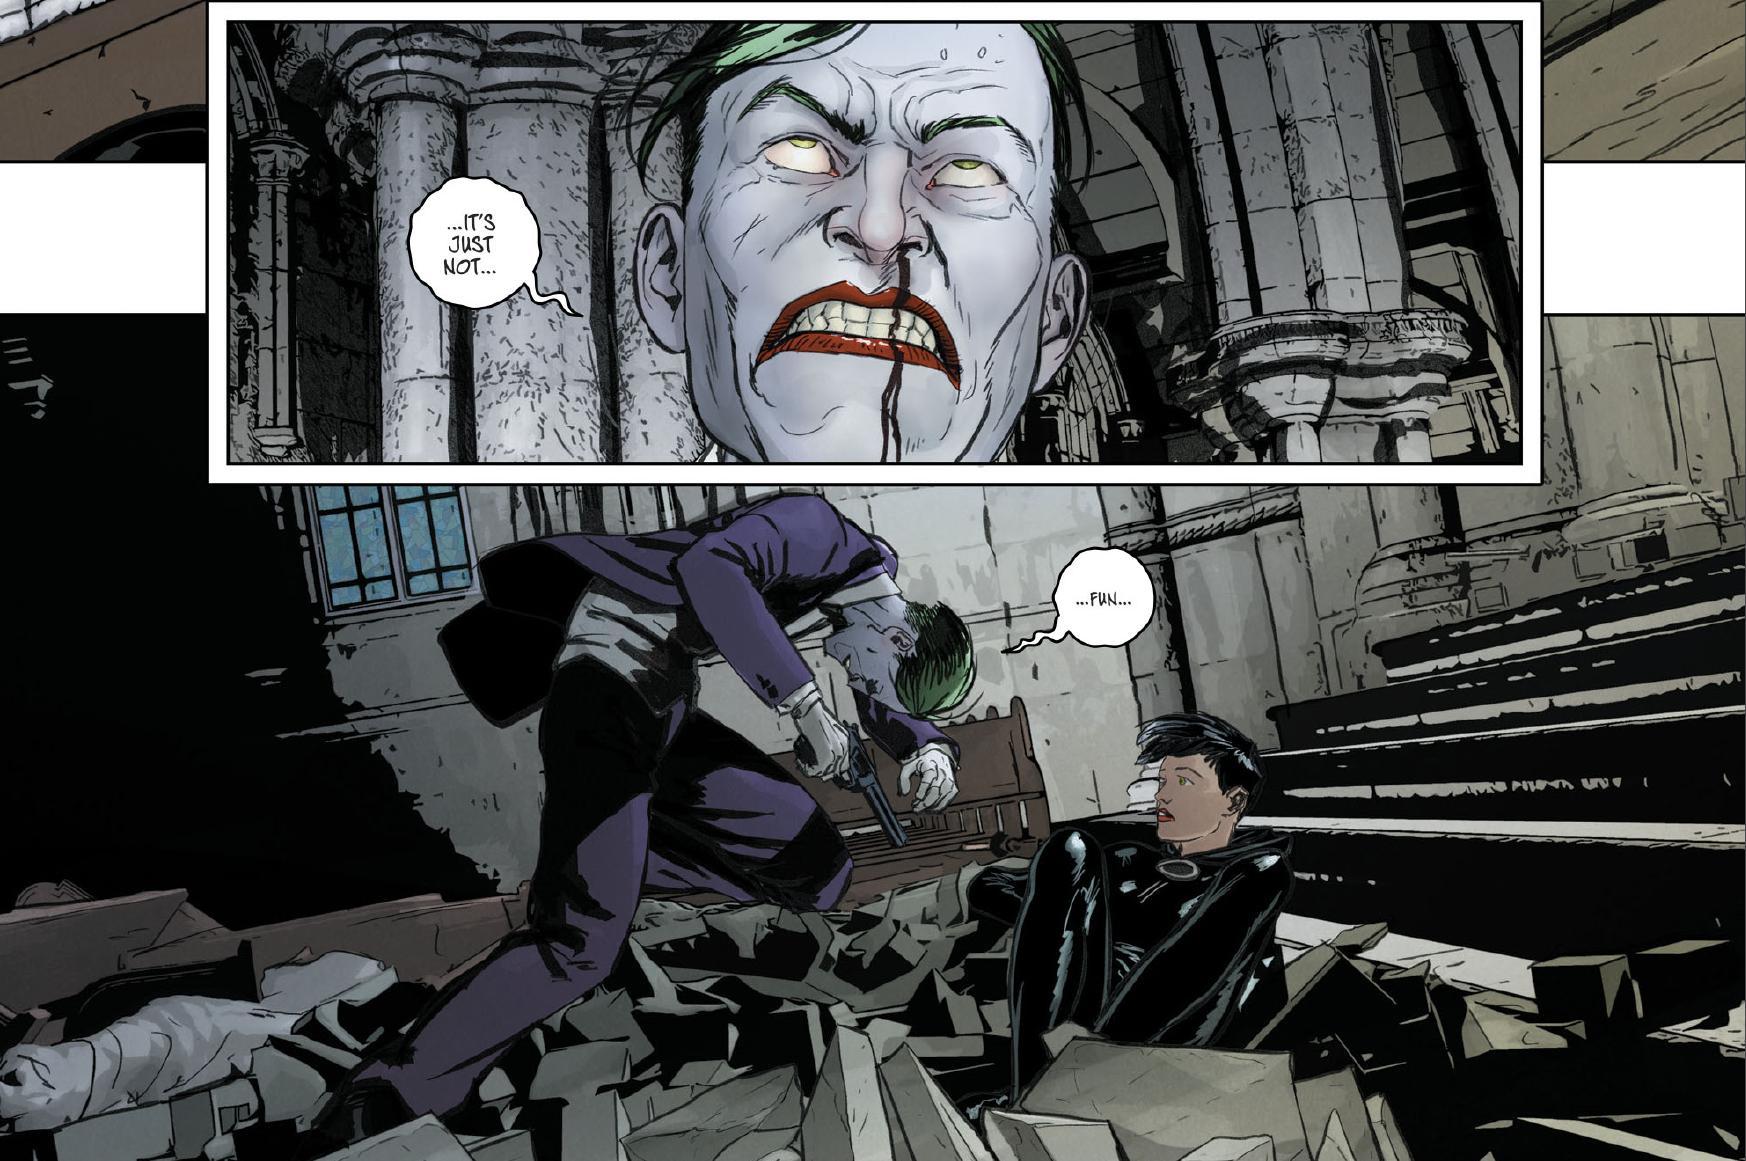 Batman Wedding Gift: The Joker May Have Given Batman The Greatest Wedding Gift